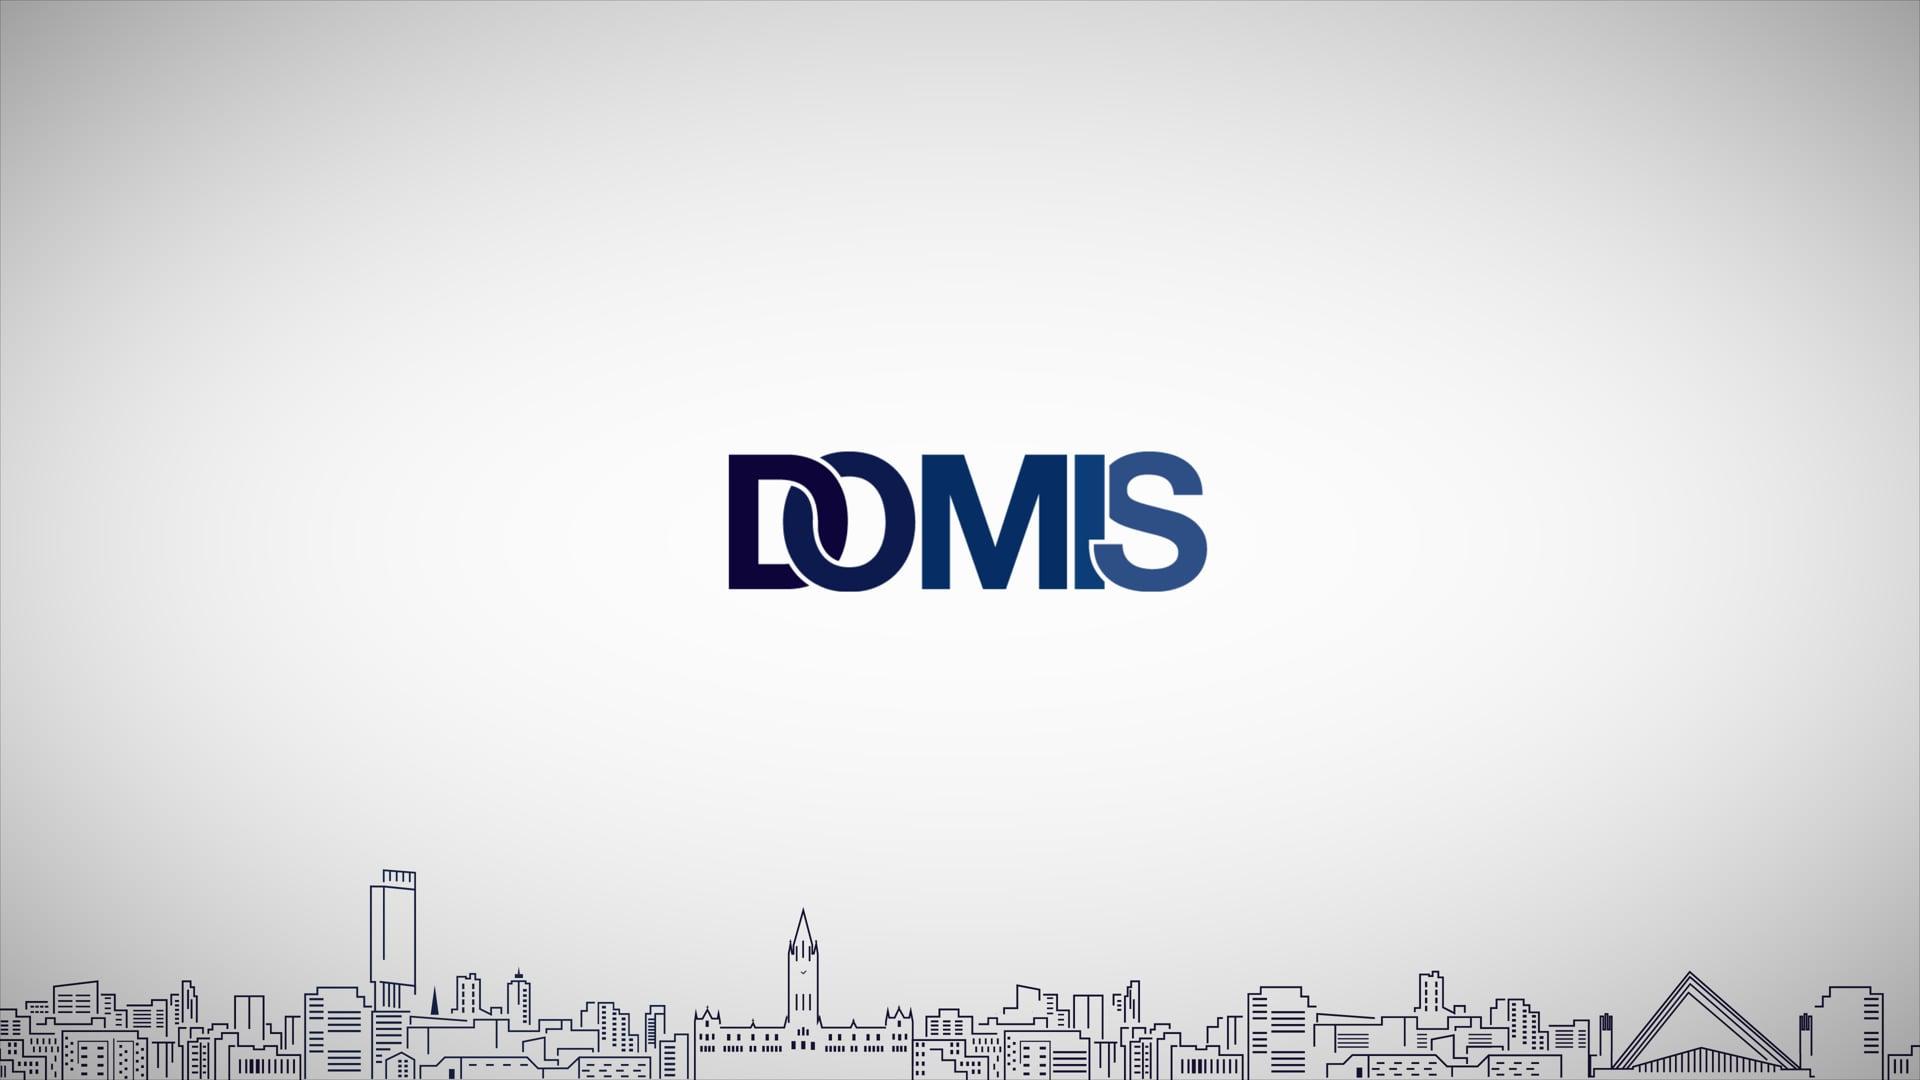 DOMIS Promotional Film